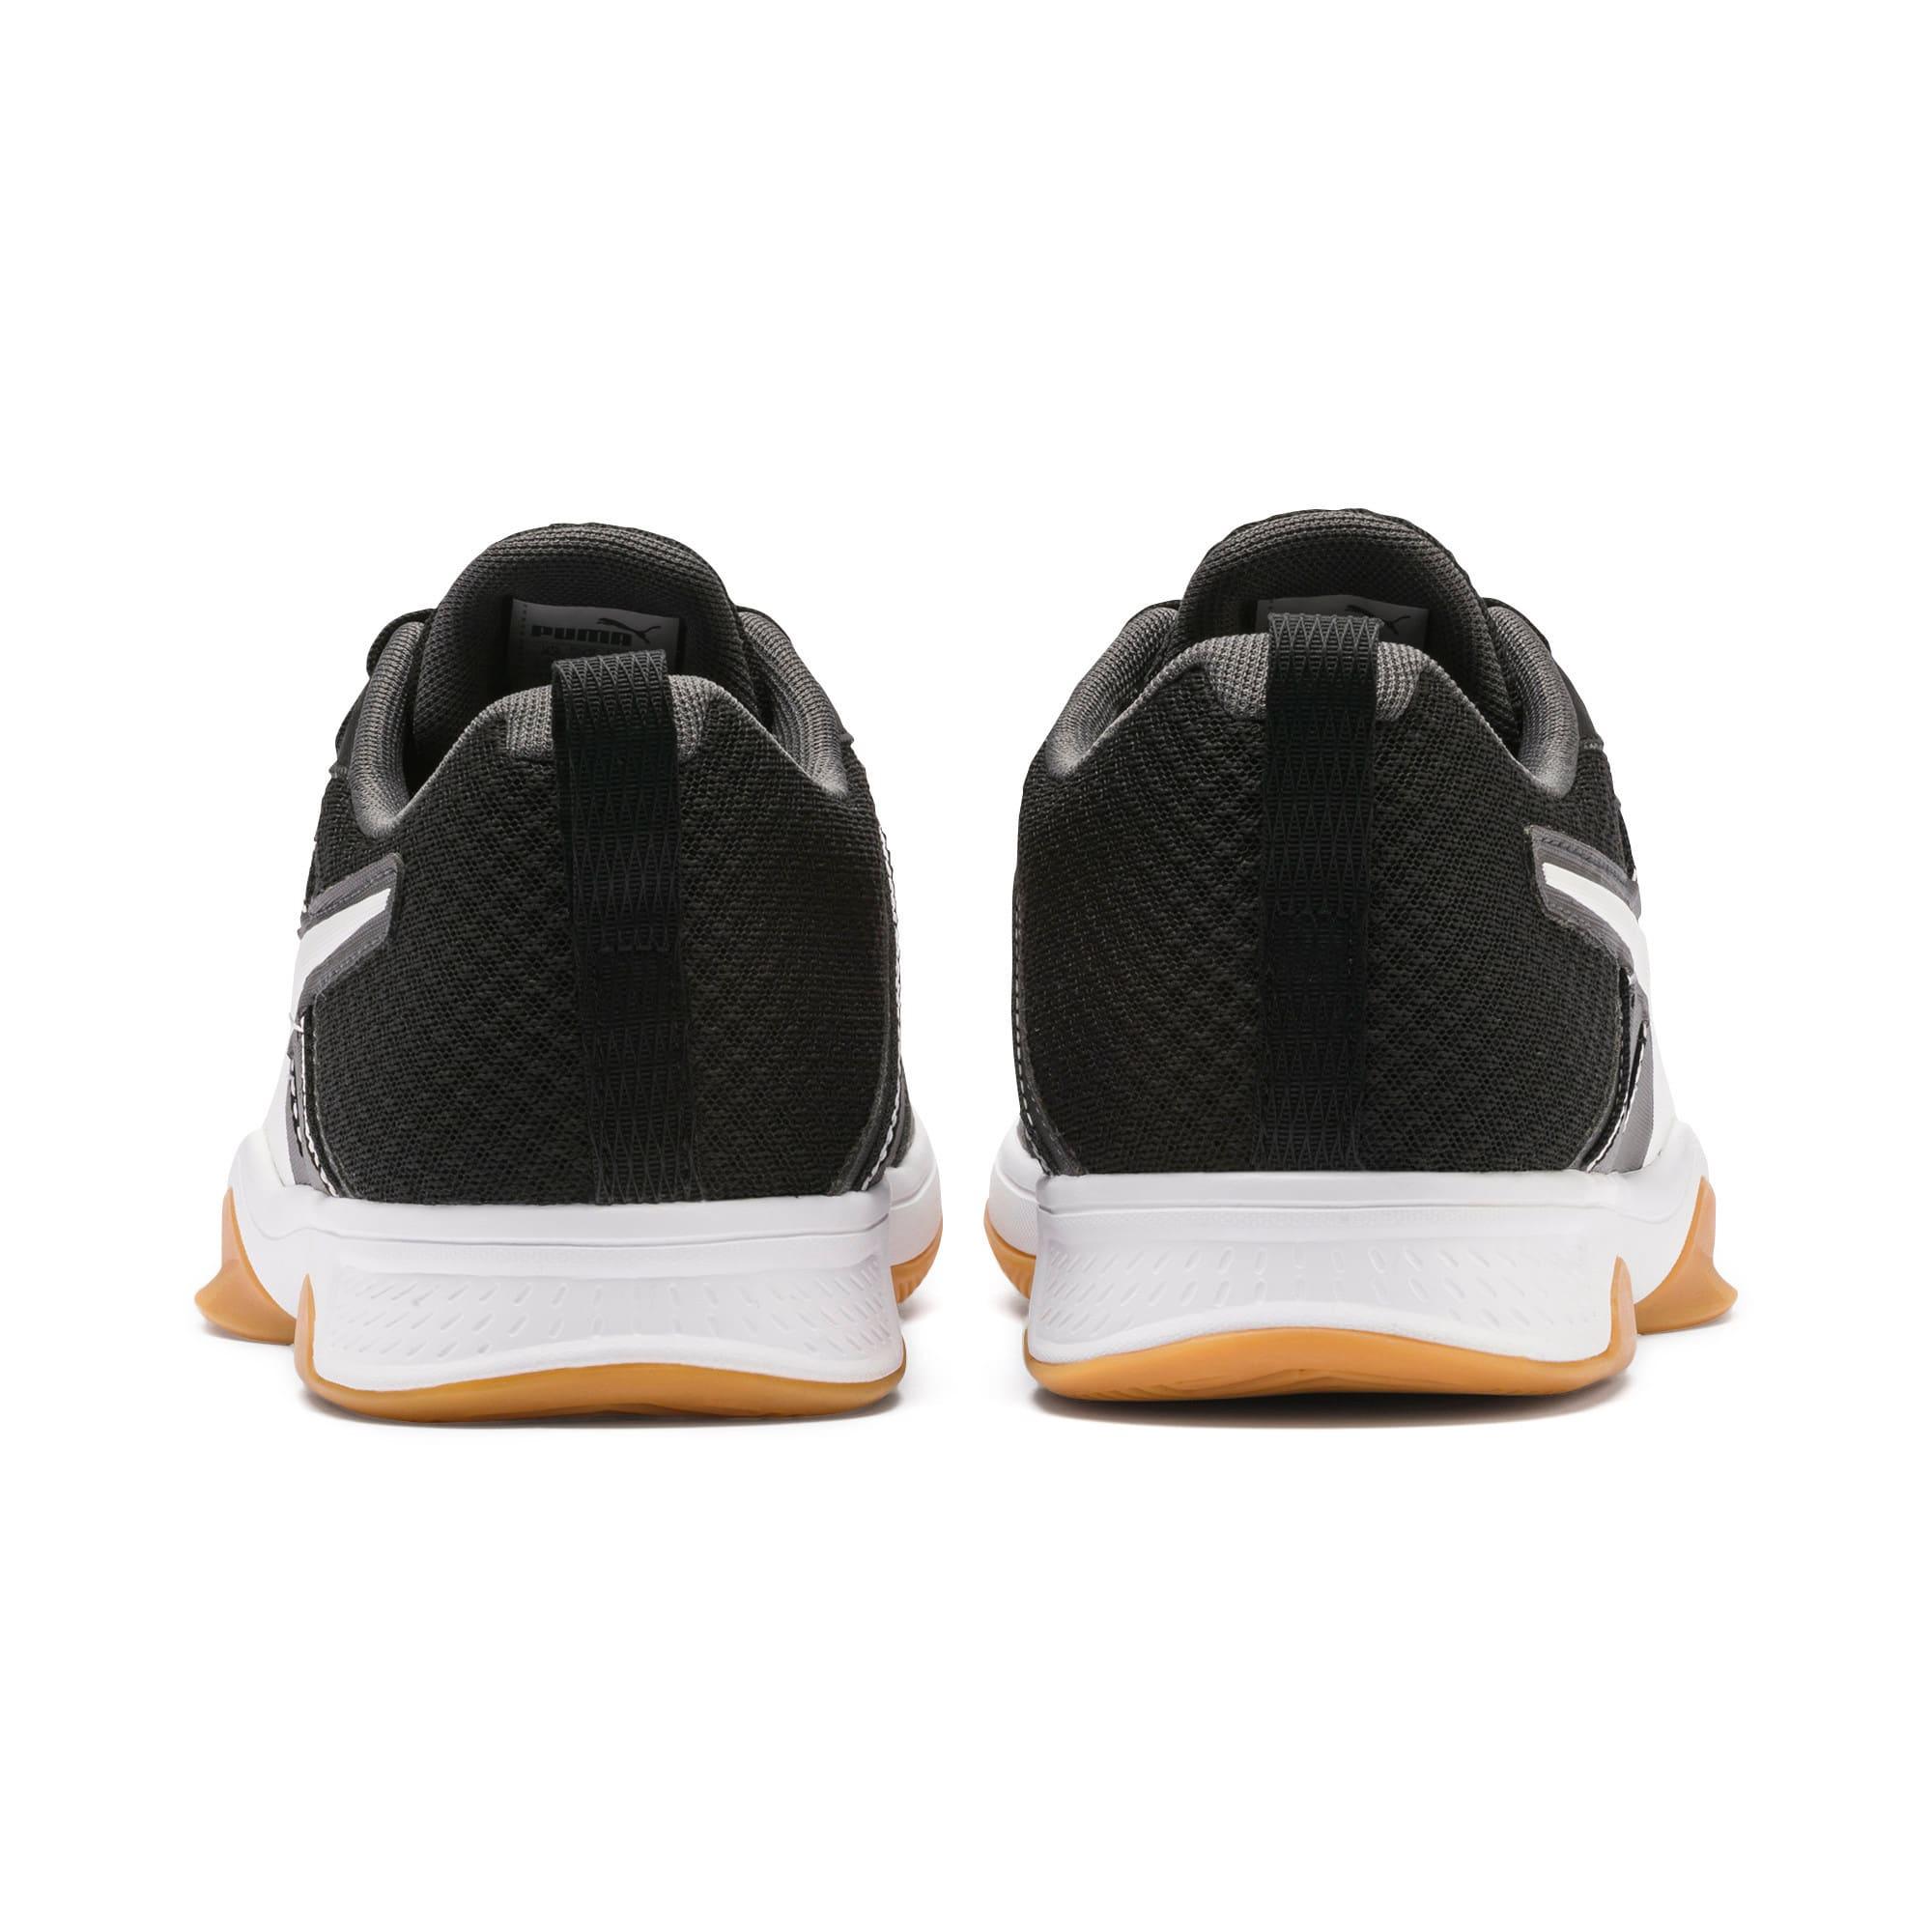 Thumbnail 2 of PUMA Stoker.18 Indoor Training Shoes, Black-White-Iron Gate-Gum, medium-IND